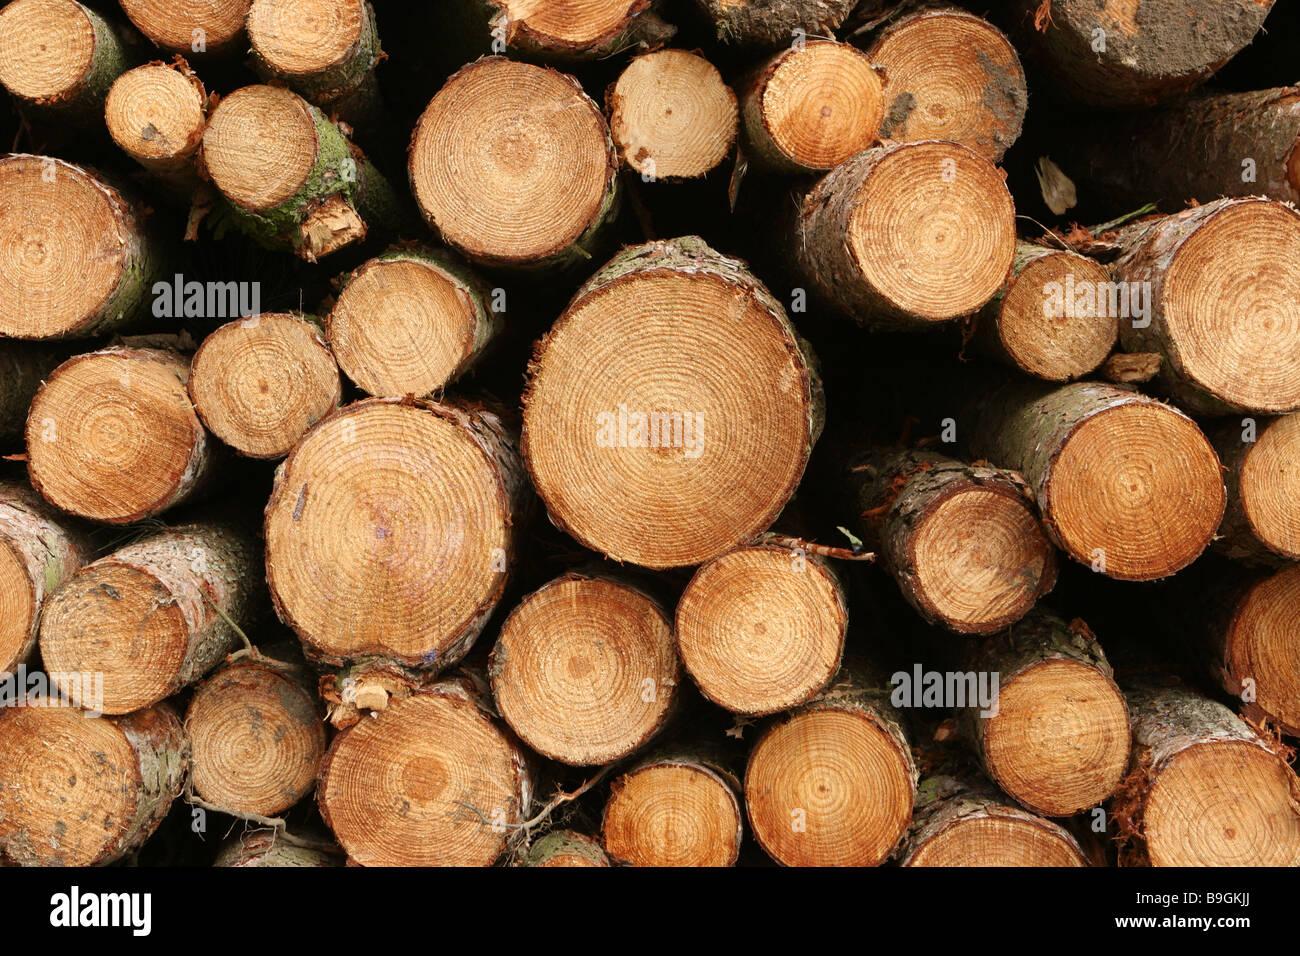 Cut Wooden Logs - Stock Image